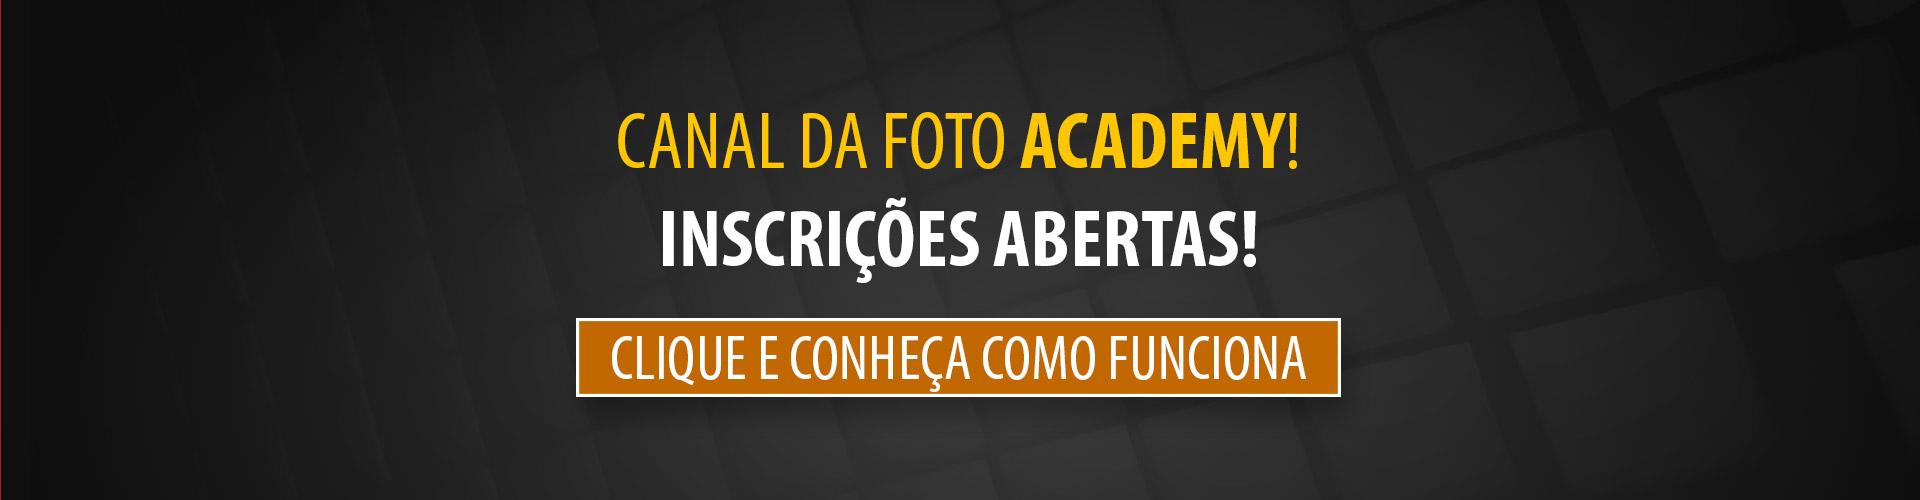 slider-canal-da-foto-academy